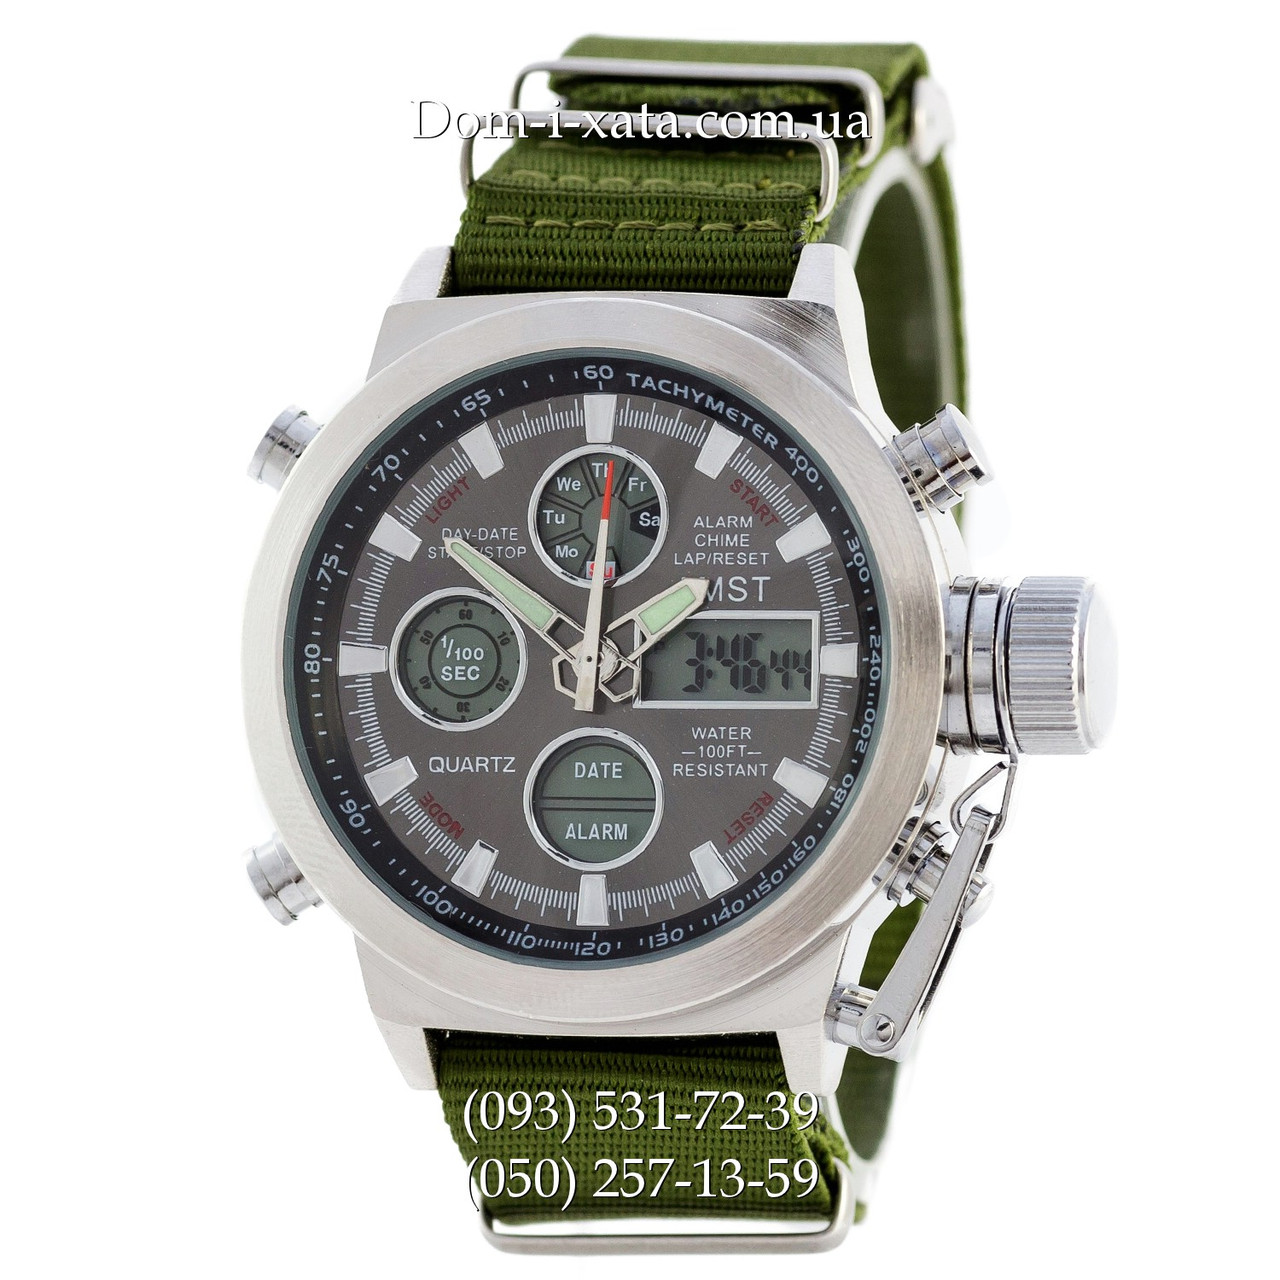 Армейские часы AMST 3003 Silver-Black Green, кварцевые, противоударные, армейские часы АМСТ, реплика, отличное качество!